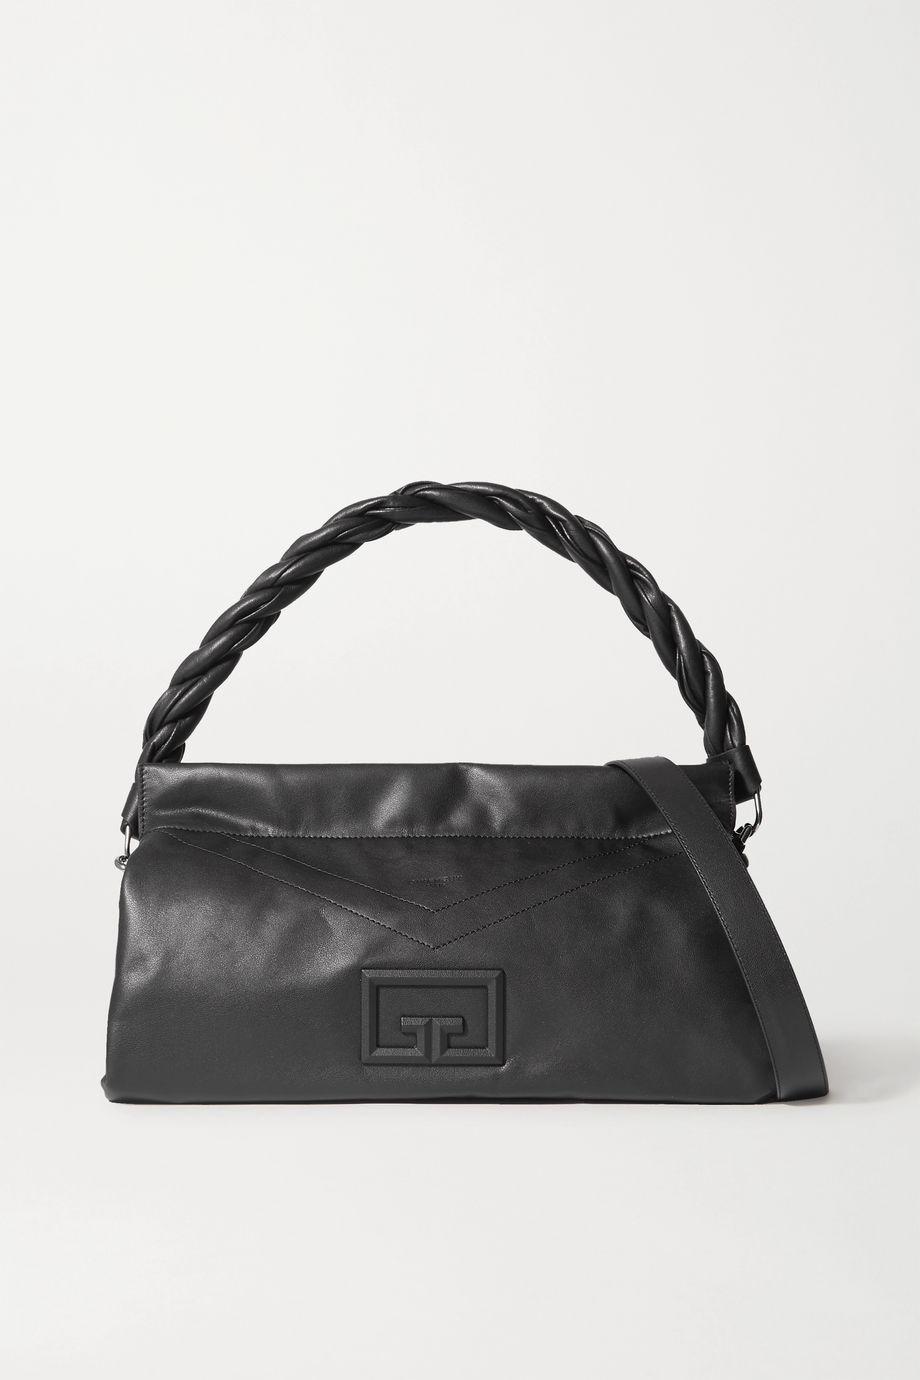 Givenchy ID93 Schultertasche aus Leder